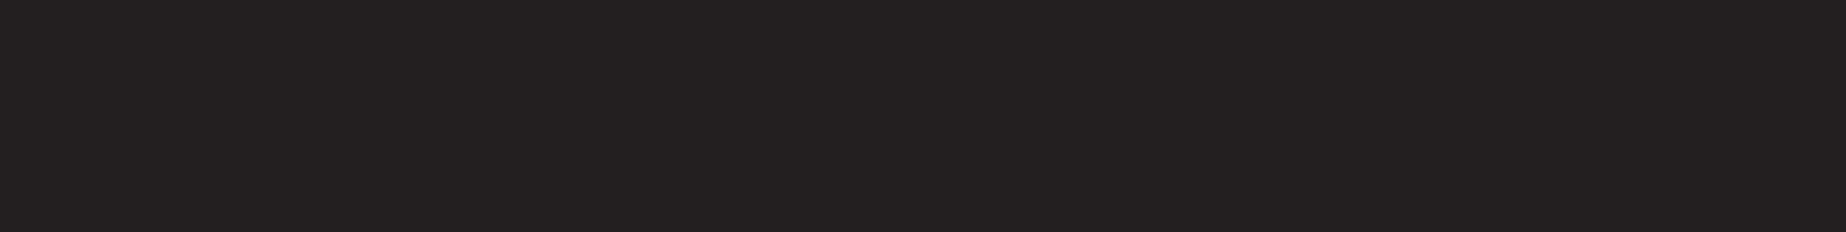 ILARIA BALDACCINI - Pianista, clavicembalista